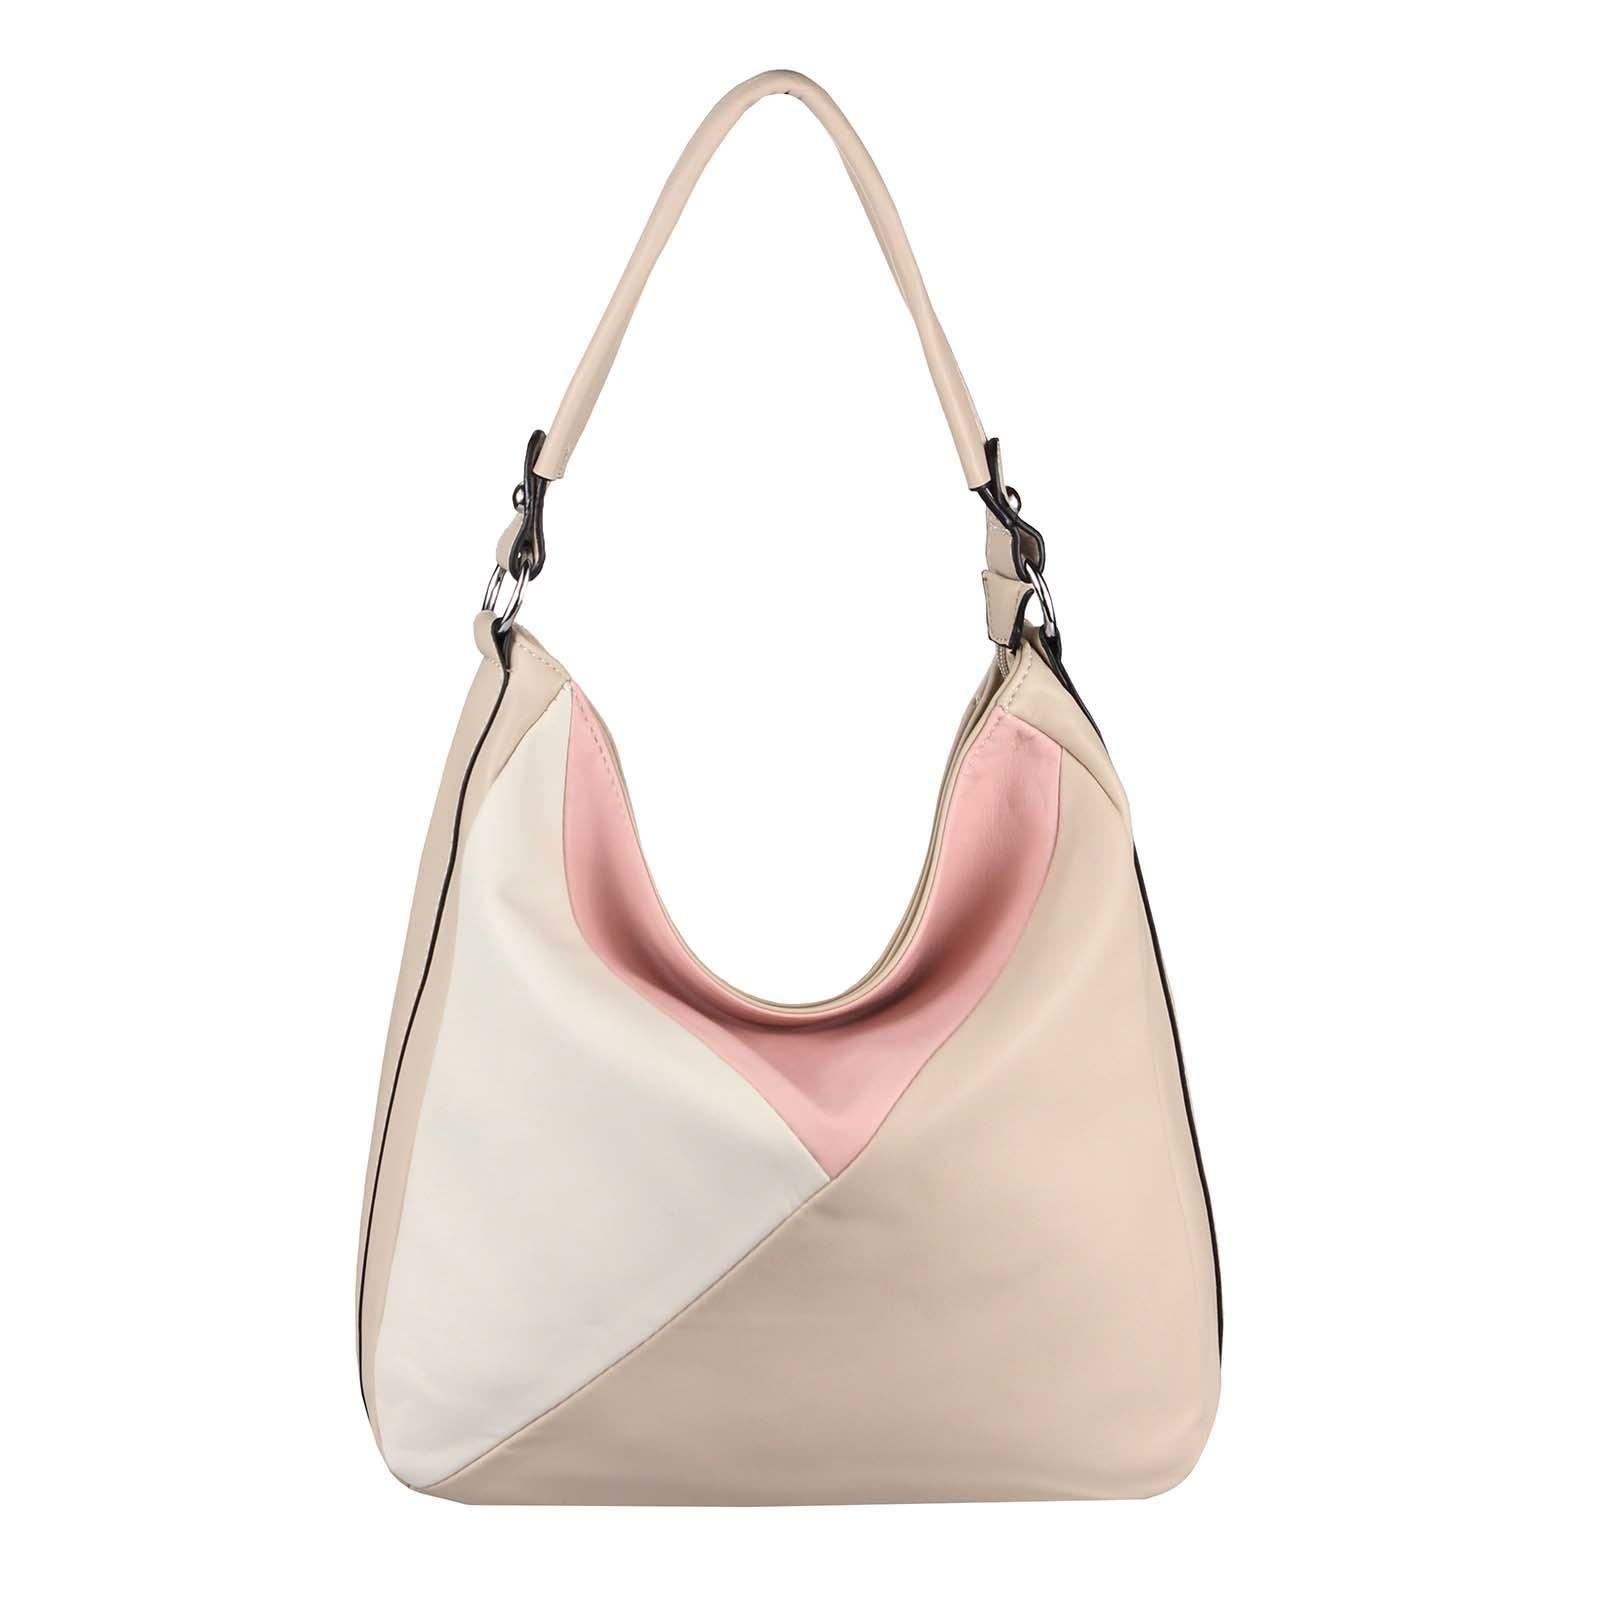 OBC DAMEN TASCHE XXL Metallic Shopper Hobo Bag Umhängetasche